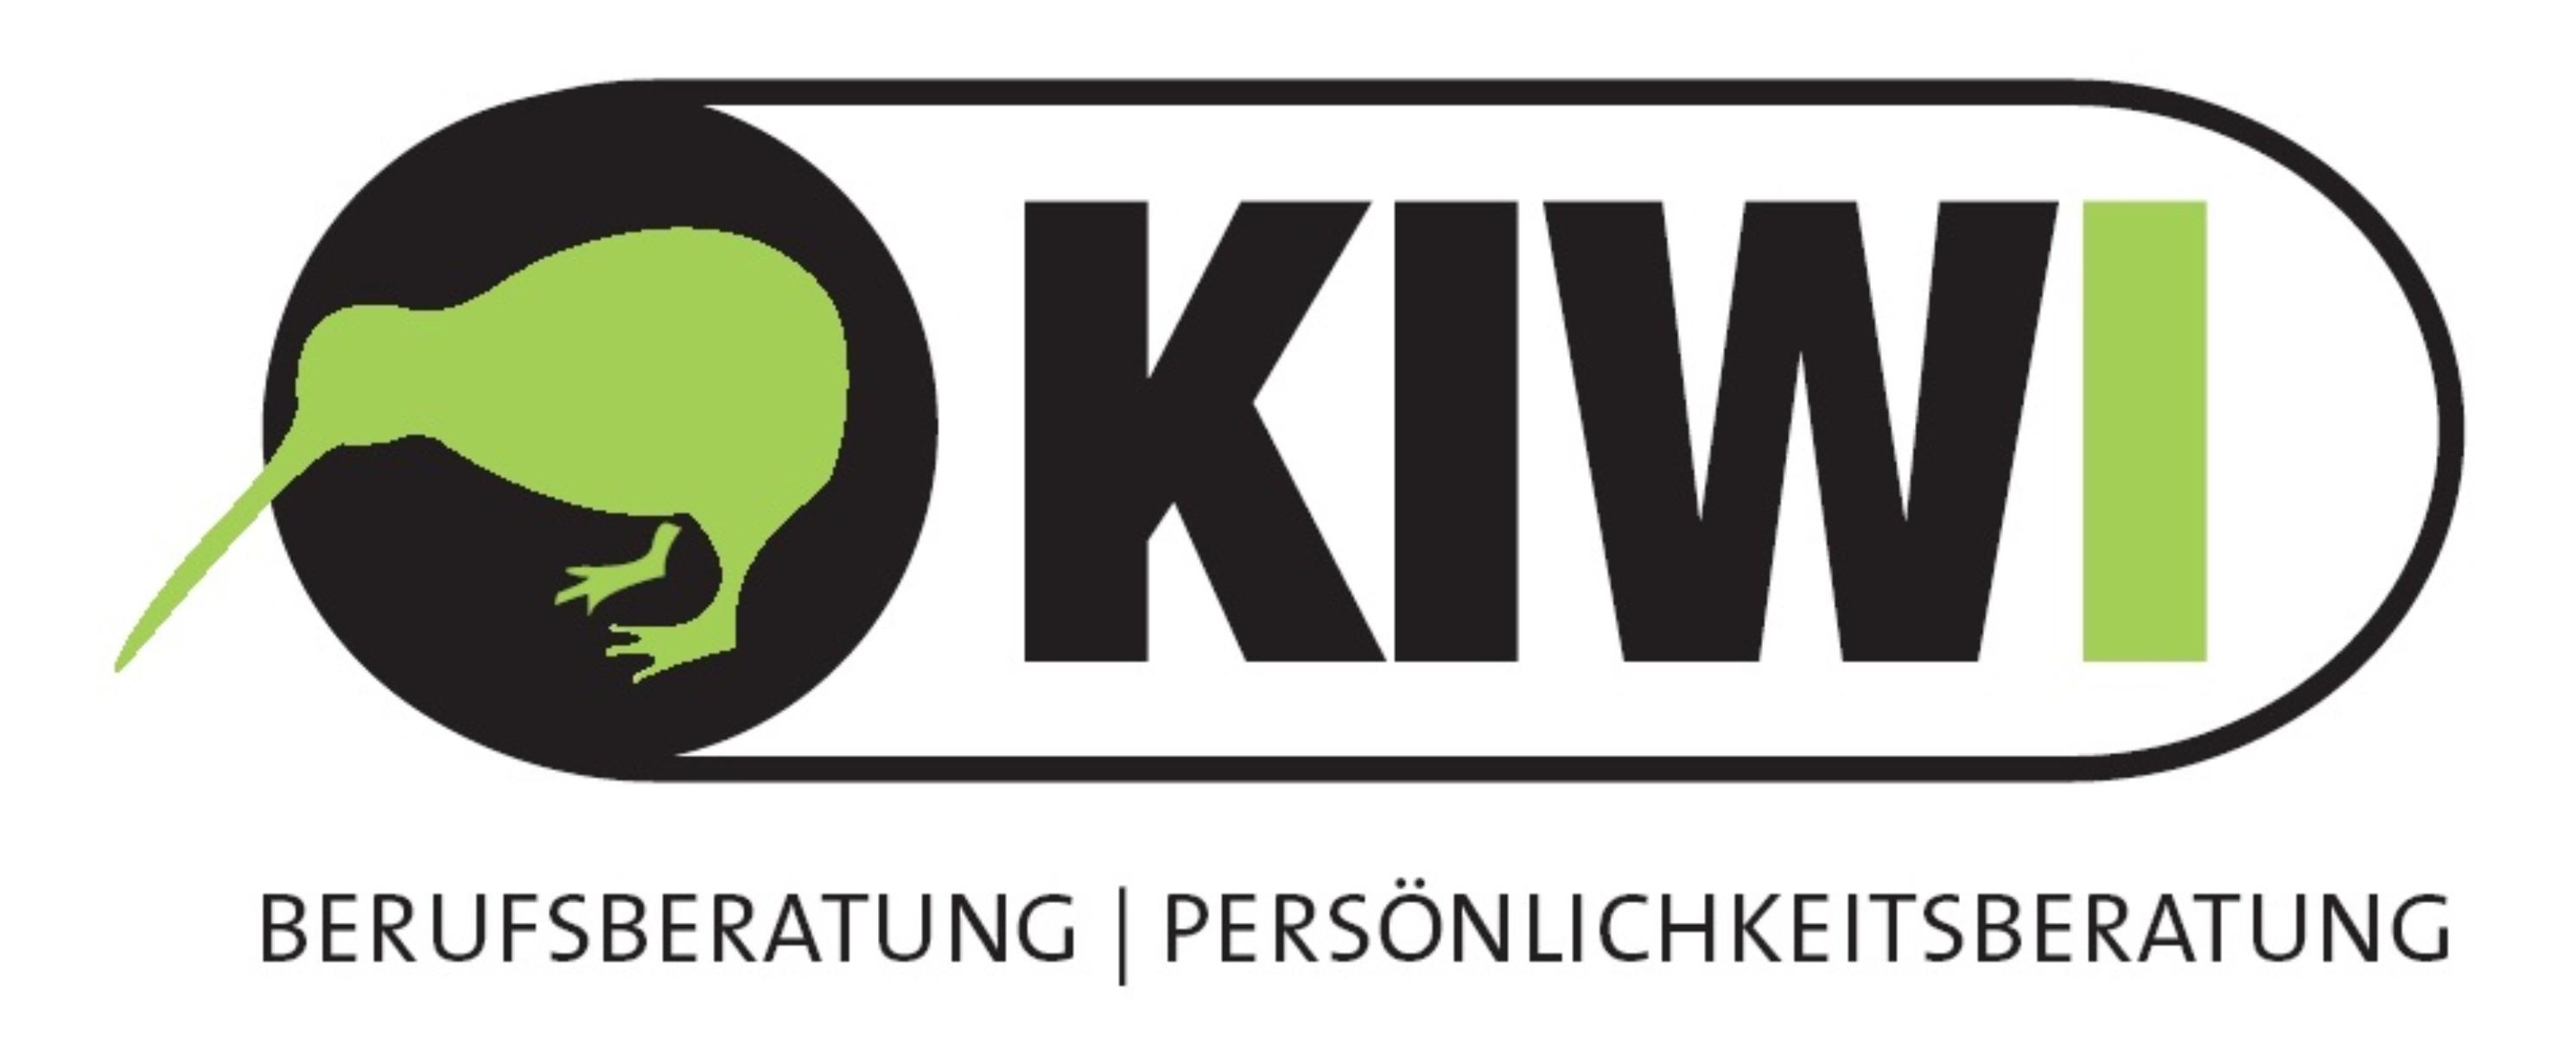 KIWI - Berufsberatung I Persönlichkeitsberatung